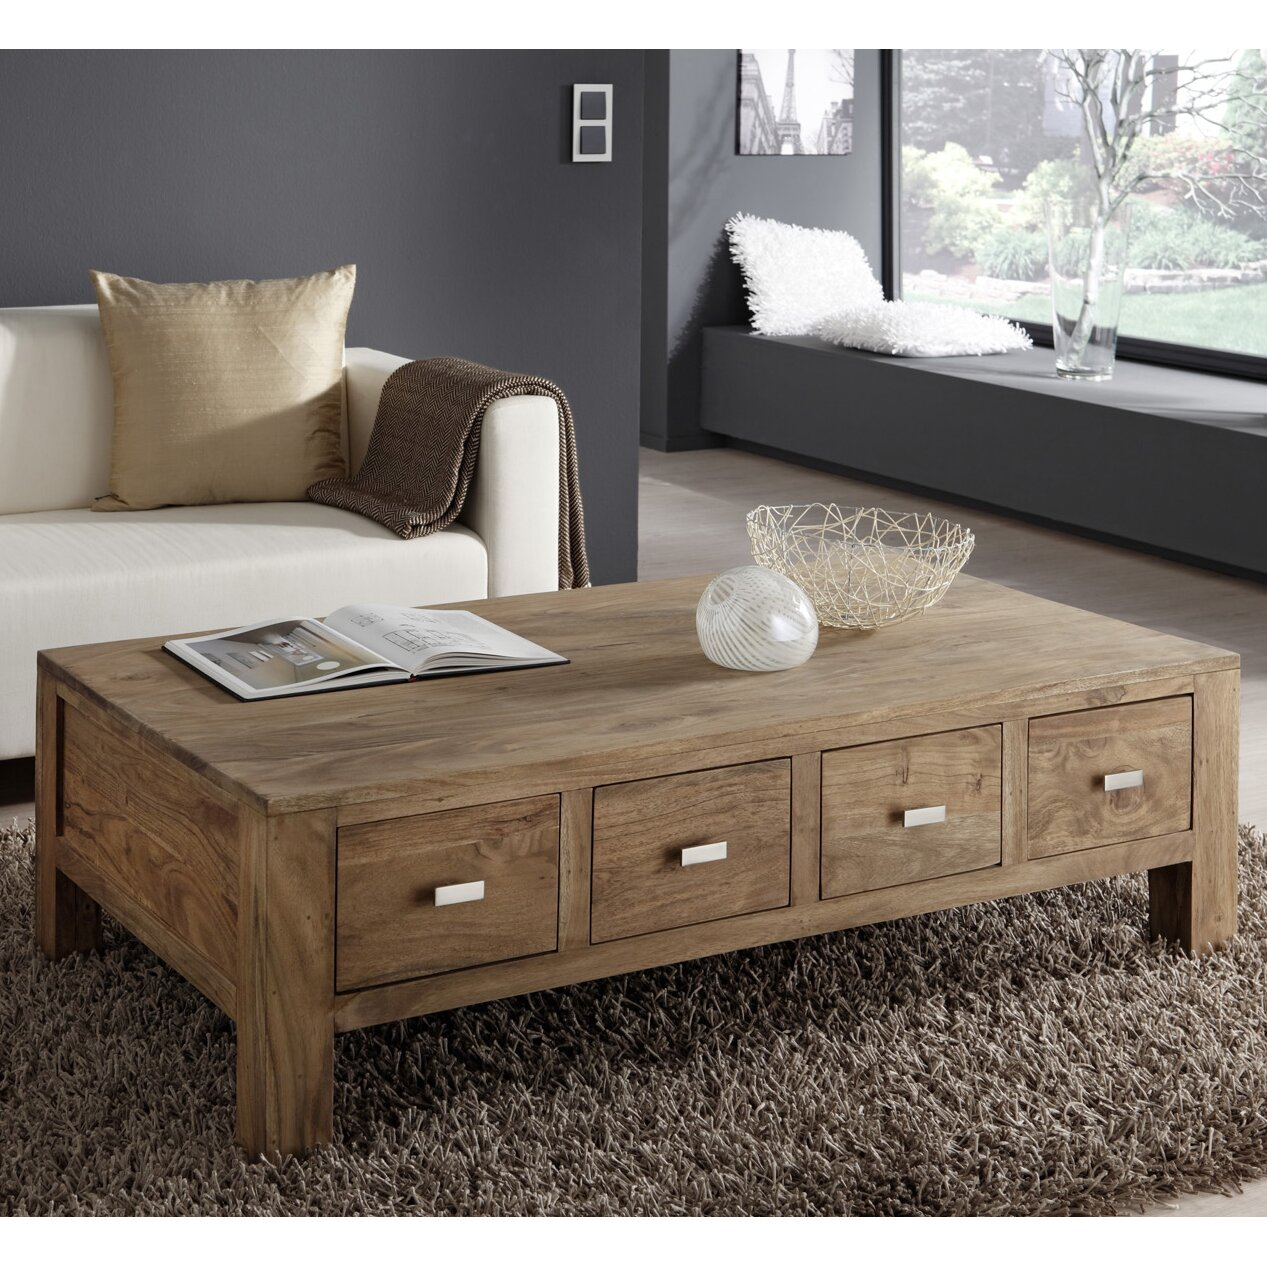 sam stil art m bel gmbh couchtisch souri. Black Bedroom Furniture Sets. Home Design Ideas